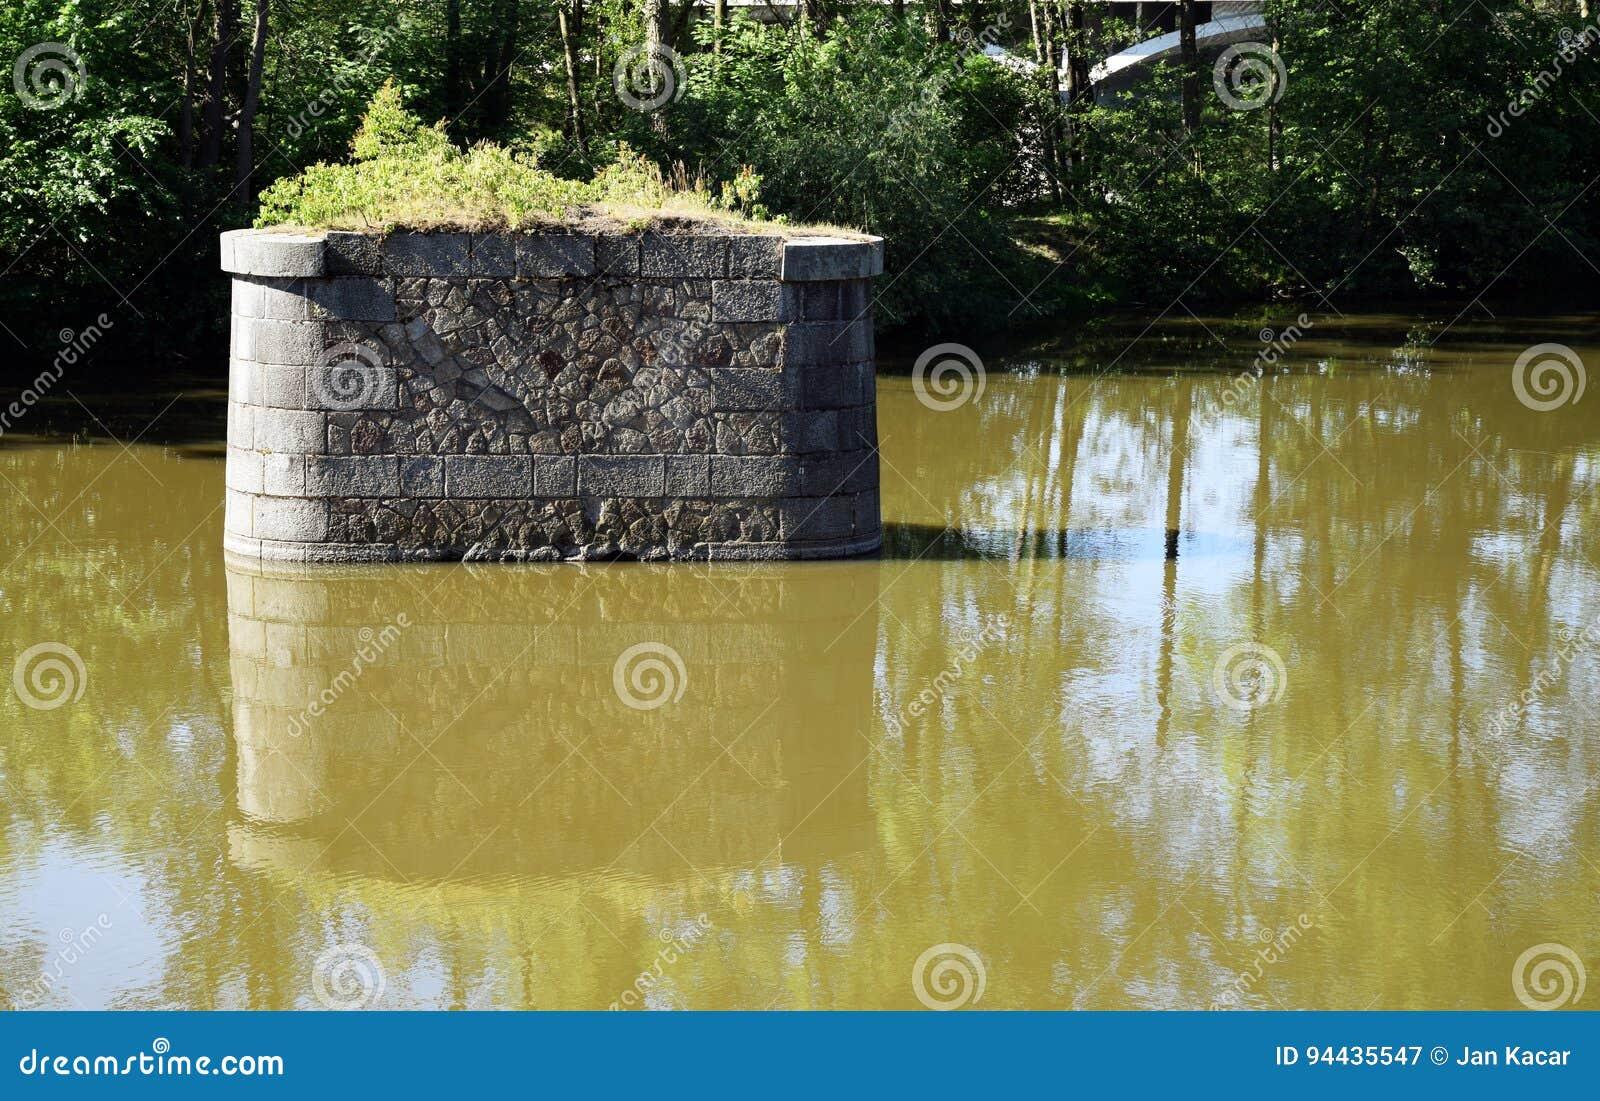 Штендер без моста